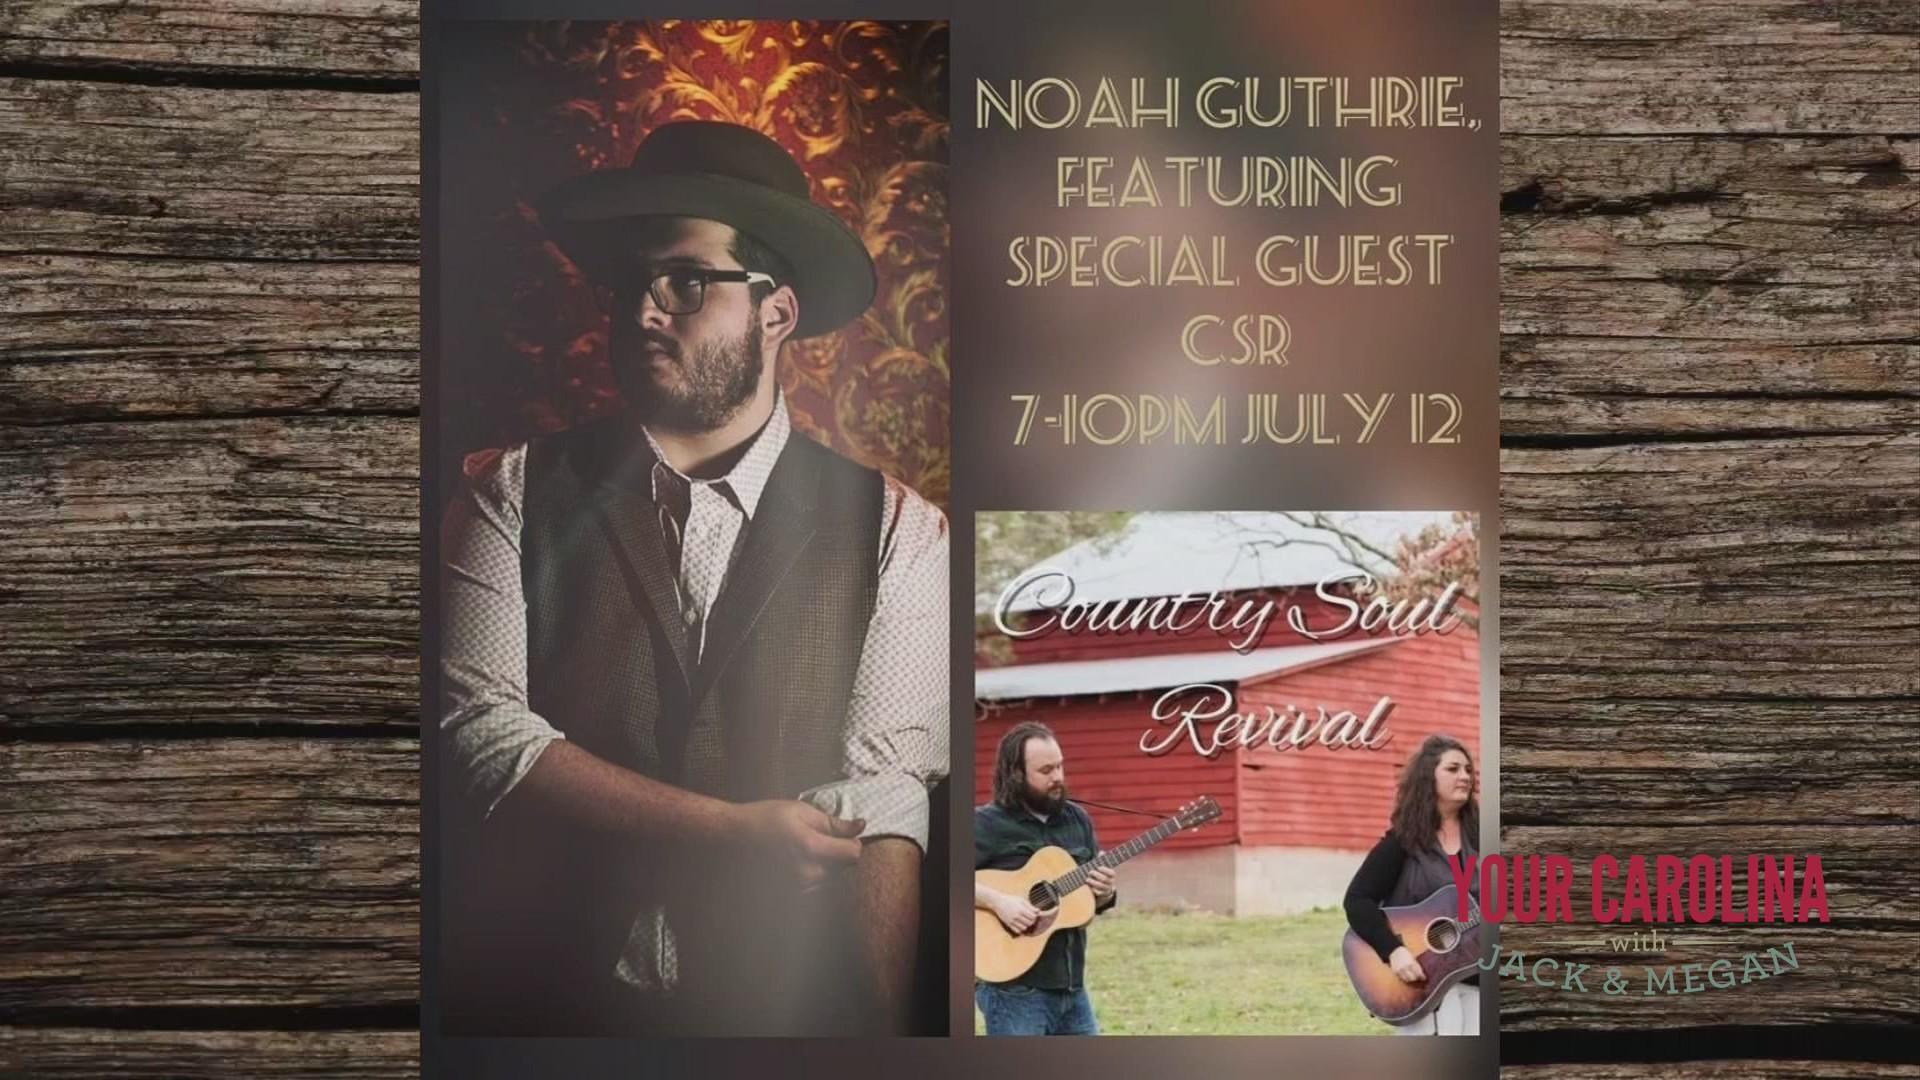 Free Concert Tonight In Woodruff